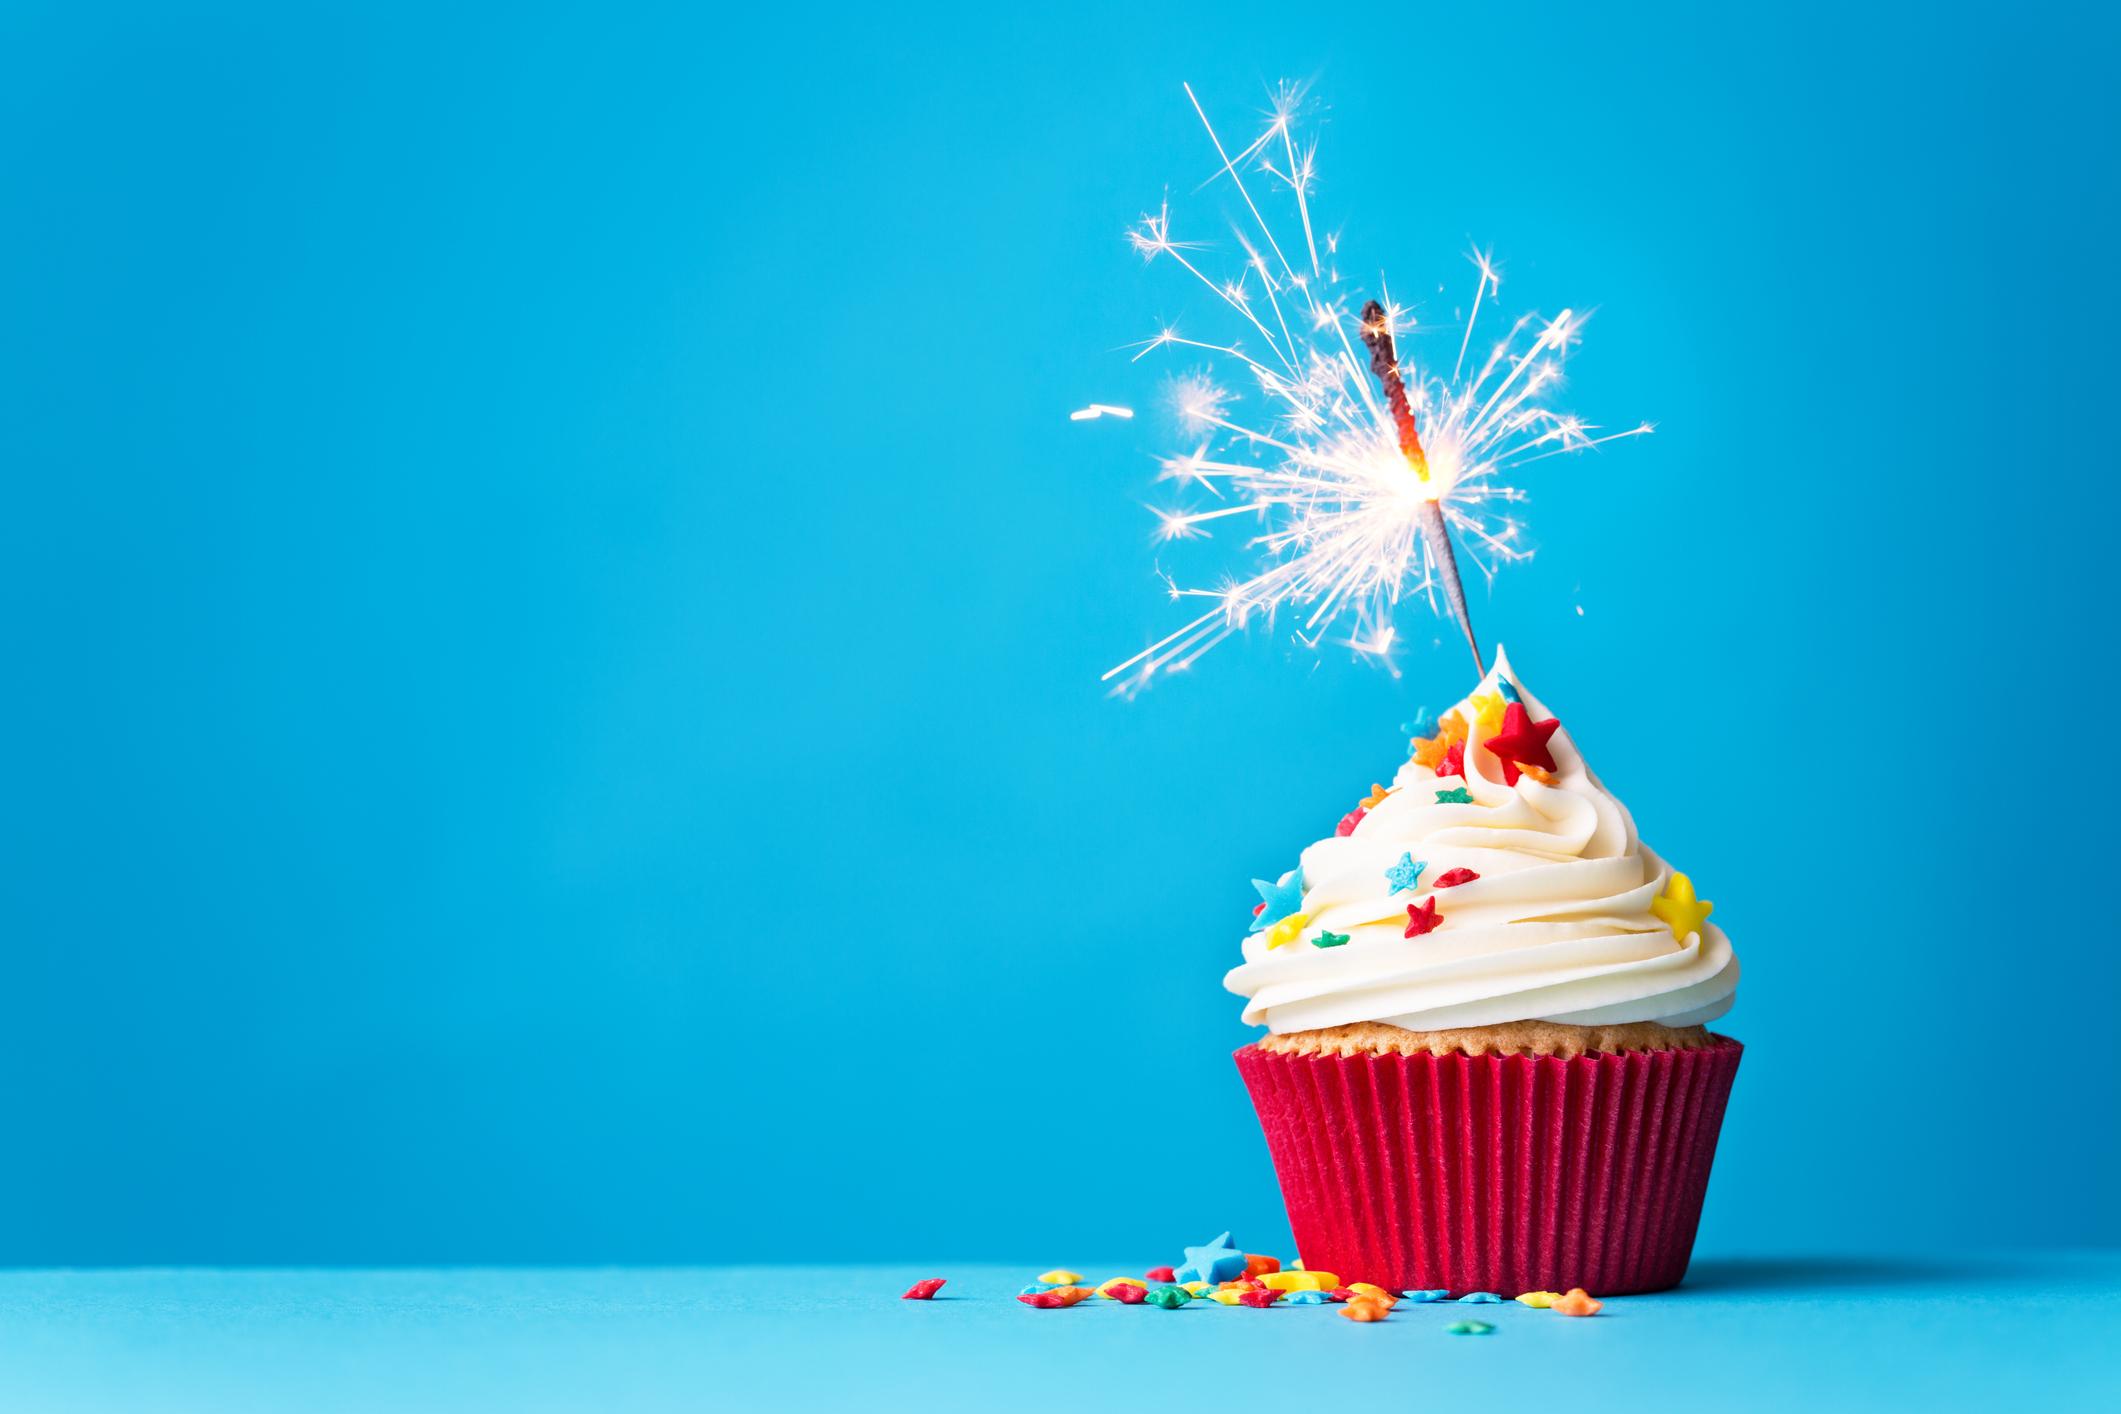 Hacks to Make Your Cupcakes Taste Amazing